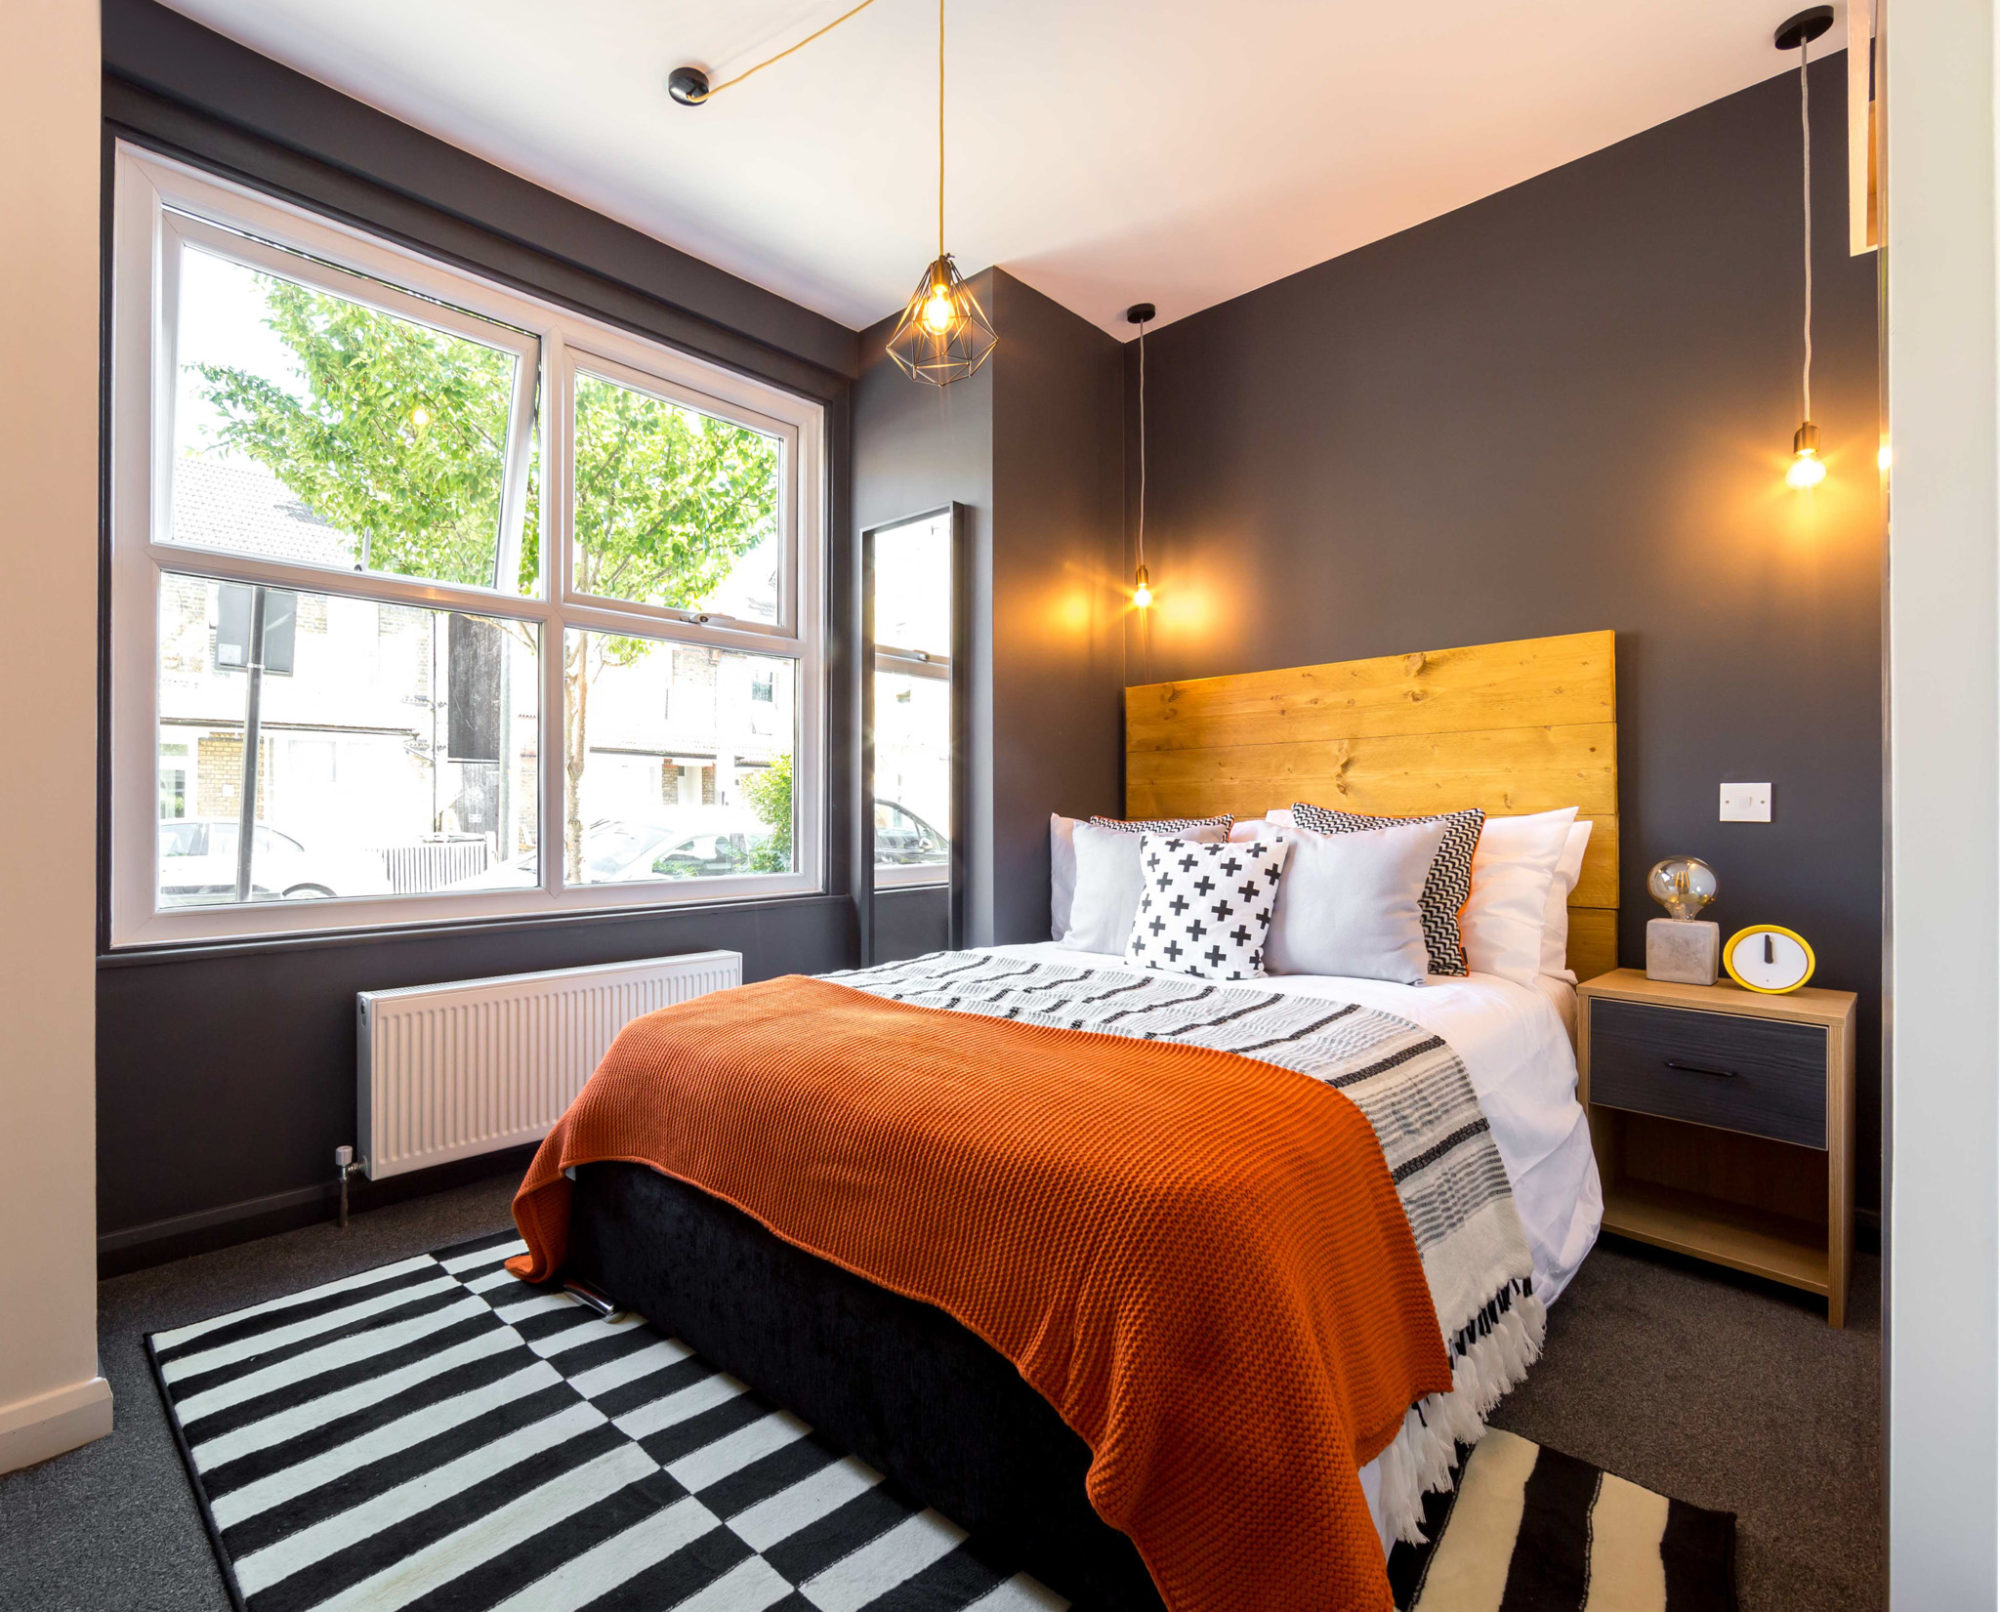 Beespace Property Design - Colour Pop Edge Co-living Concept